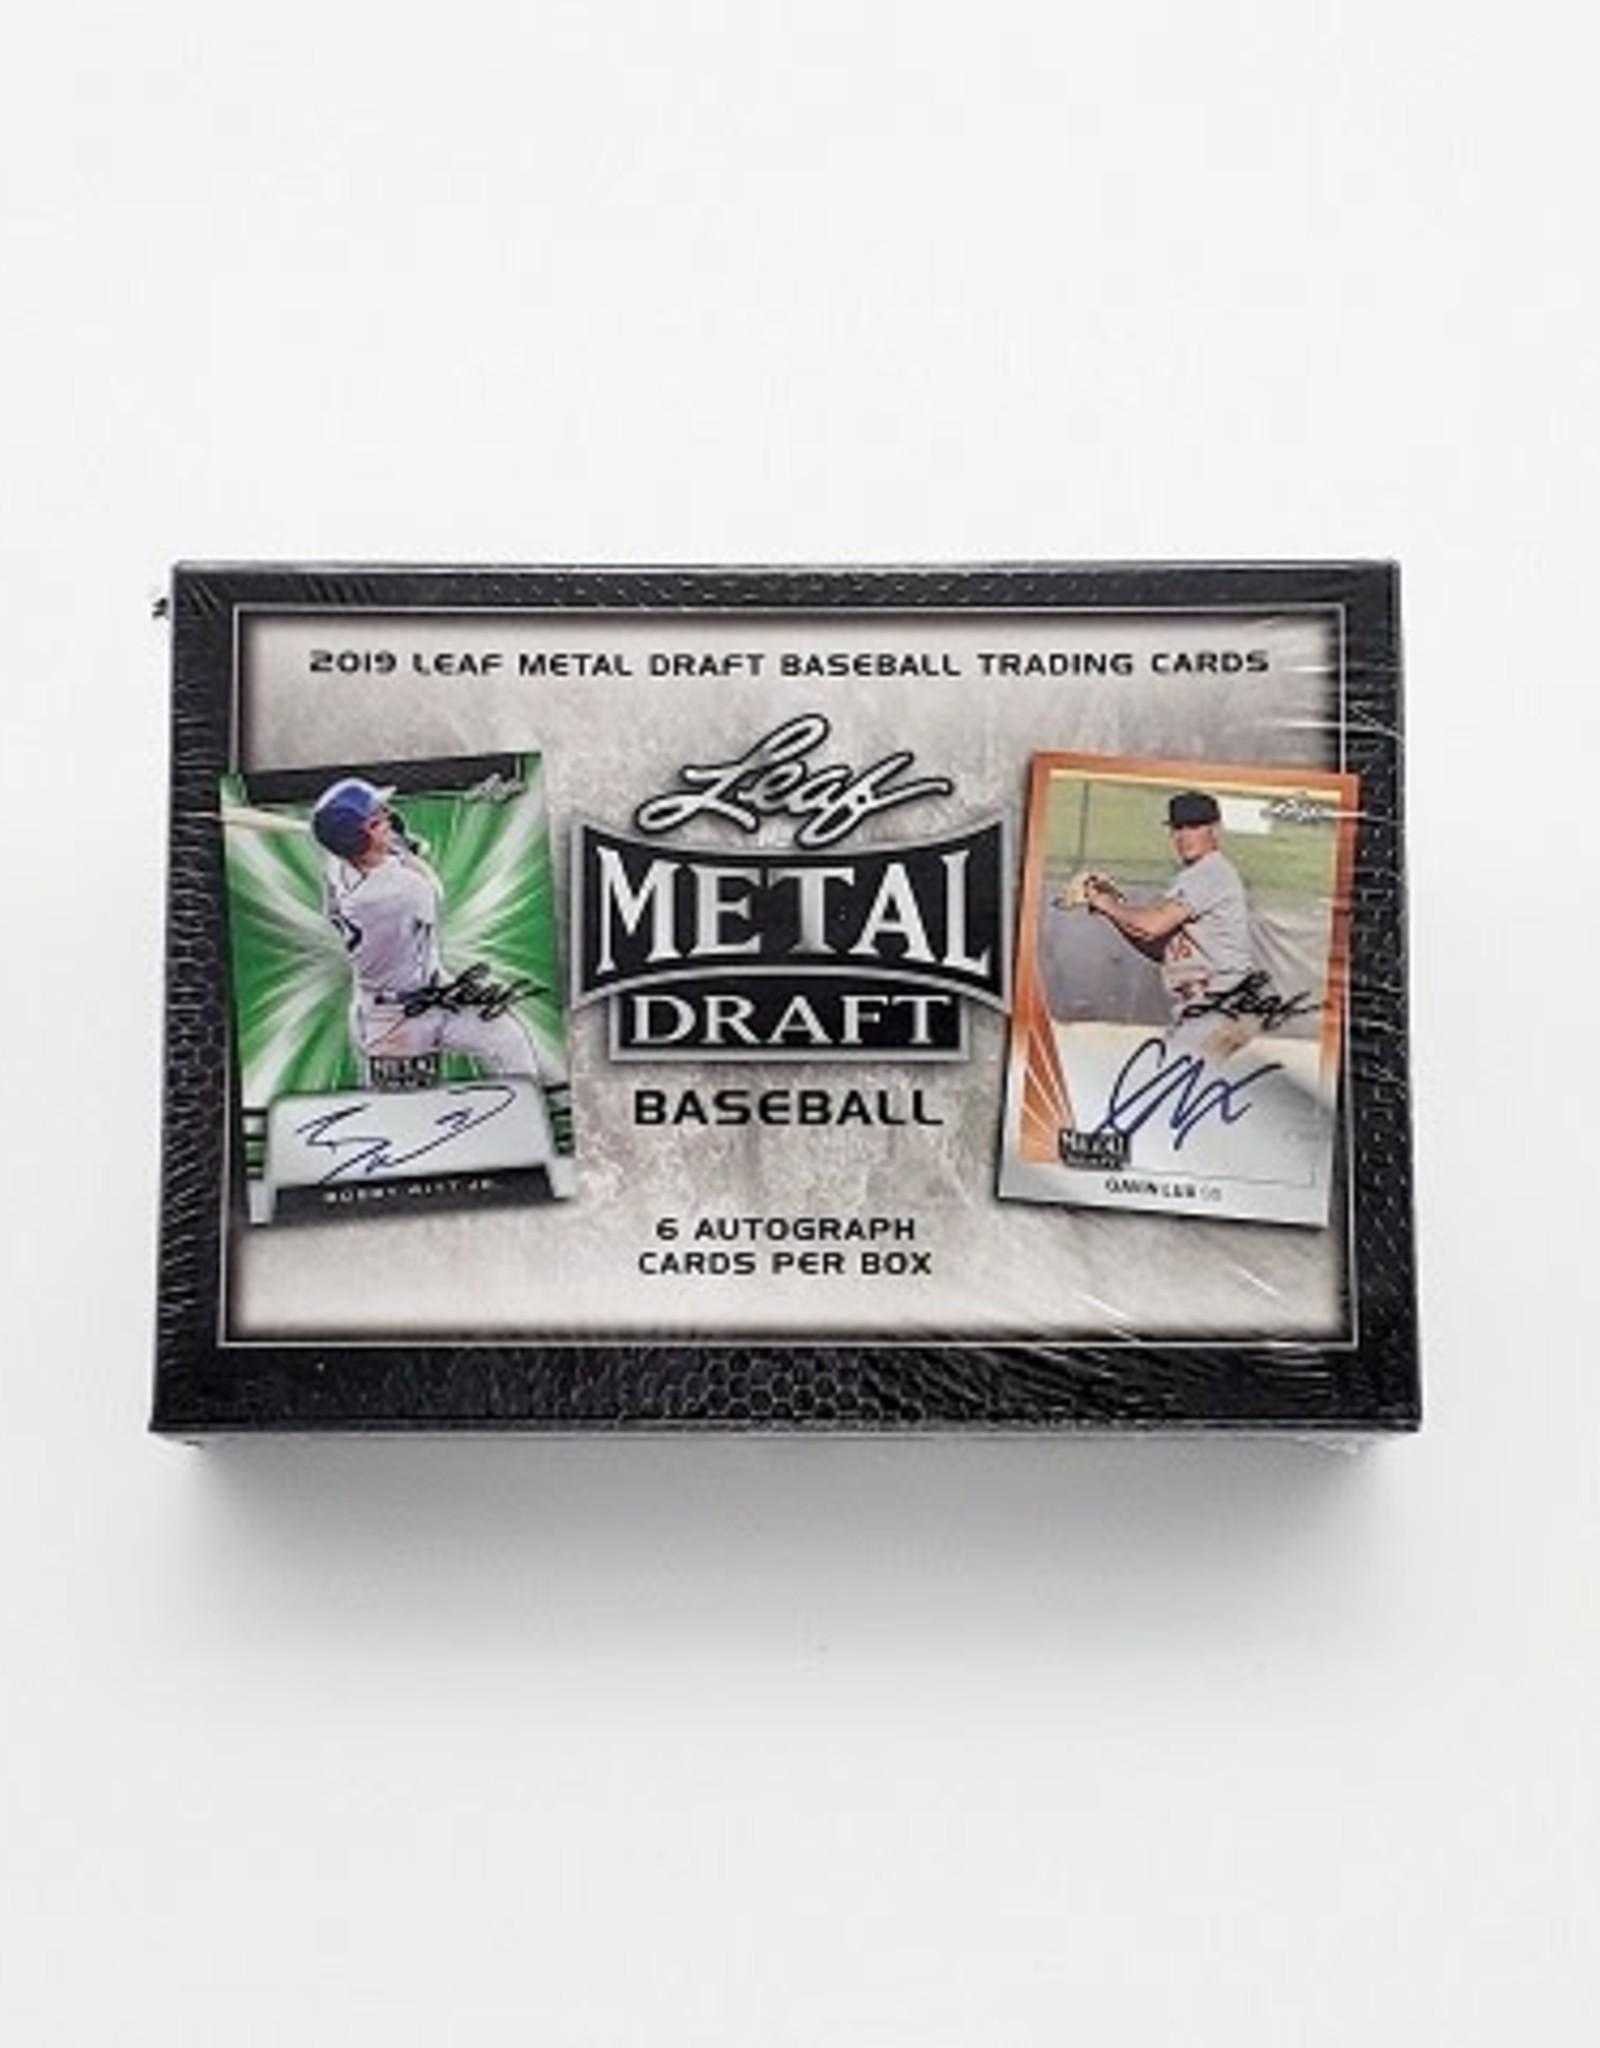 Leaf Trading Cards 2019 Leaf Metal Draft Baseball